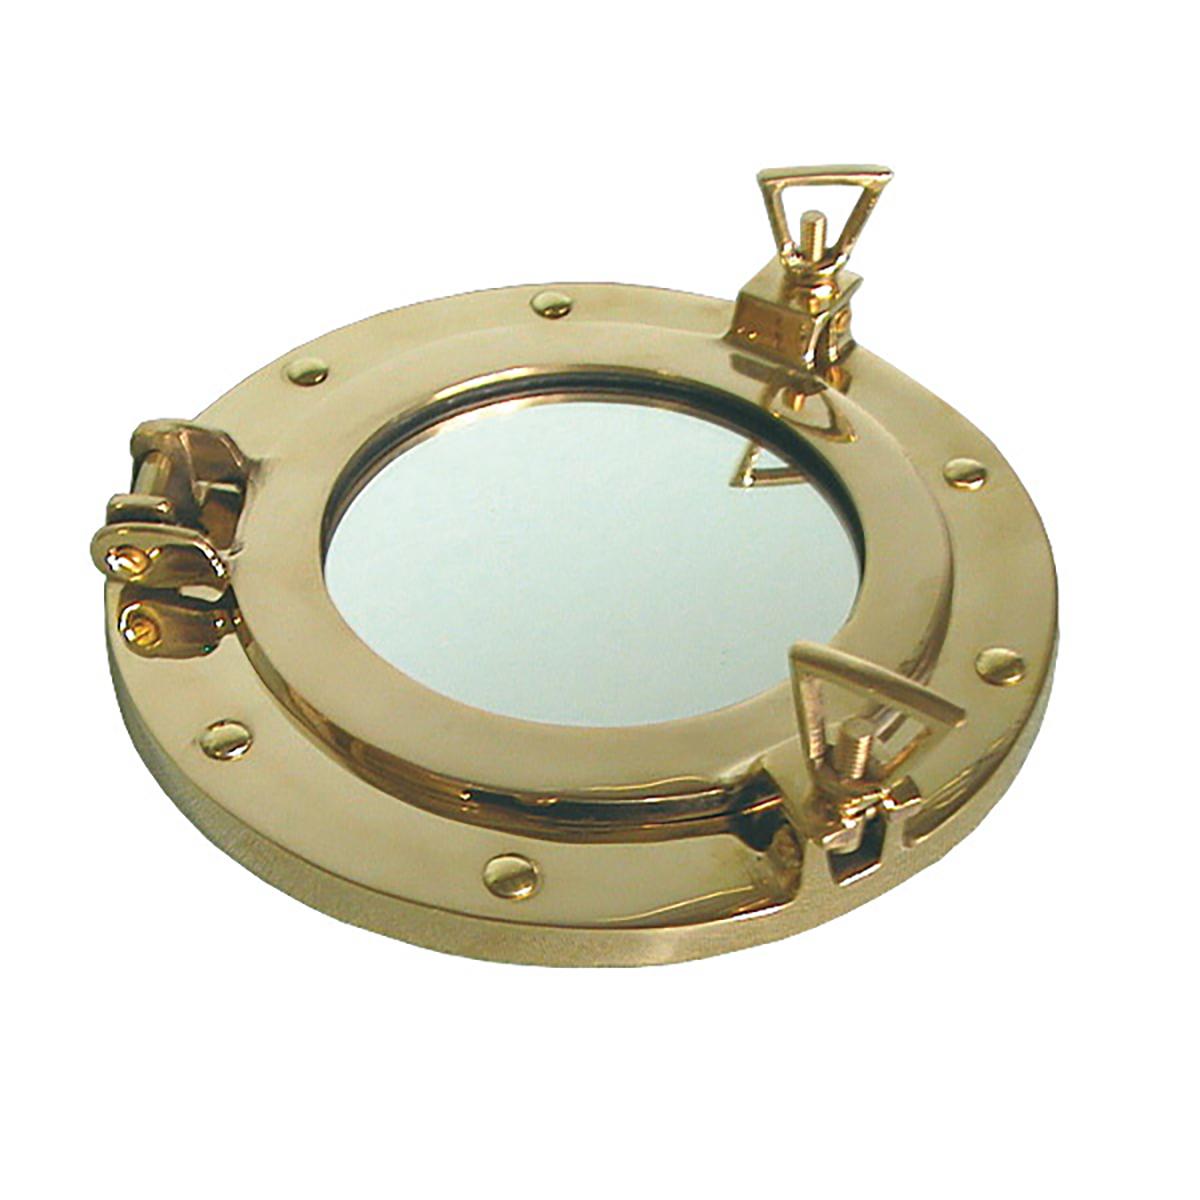 Hajóablak tükörrel 15 cm Tükör